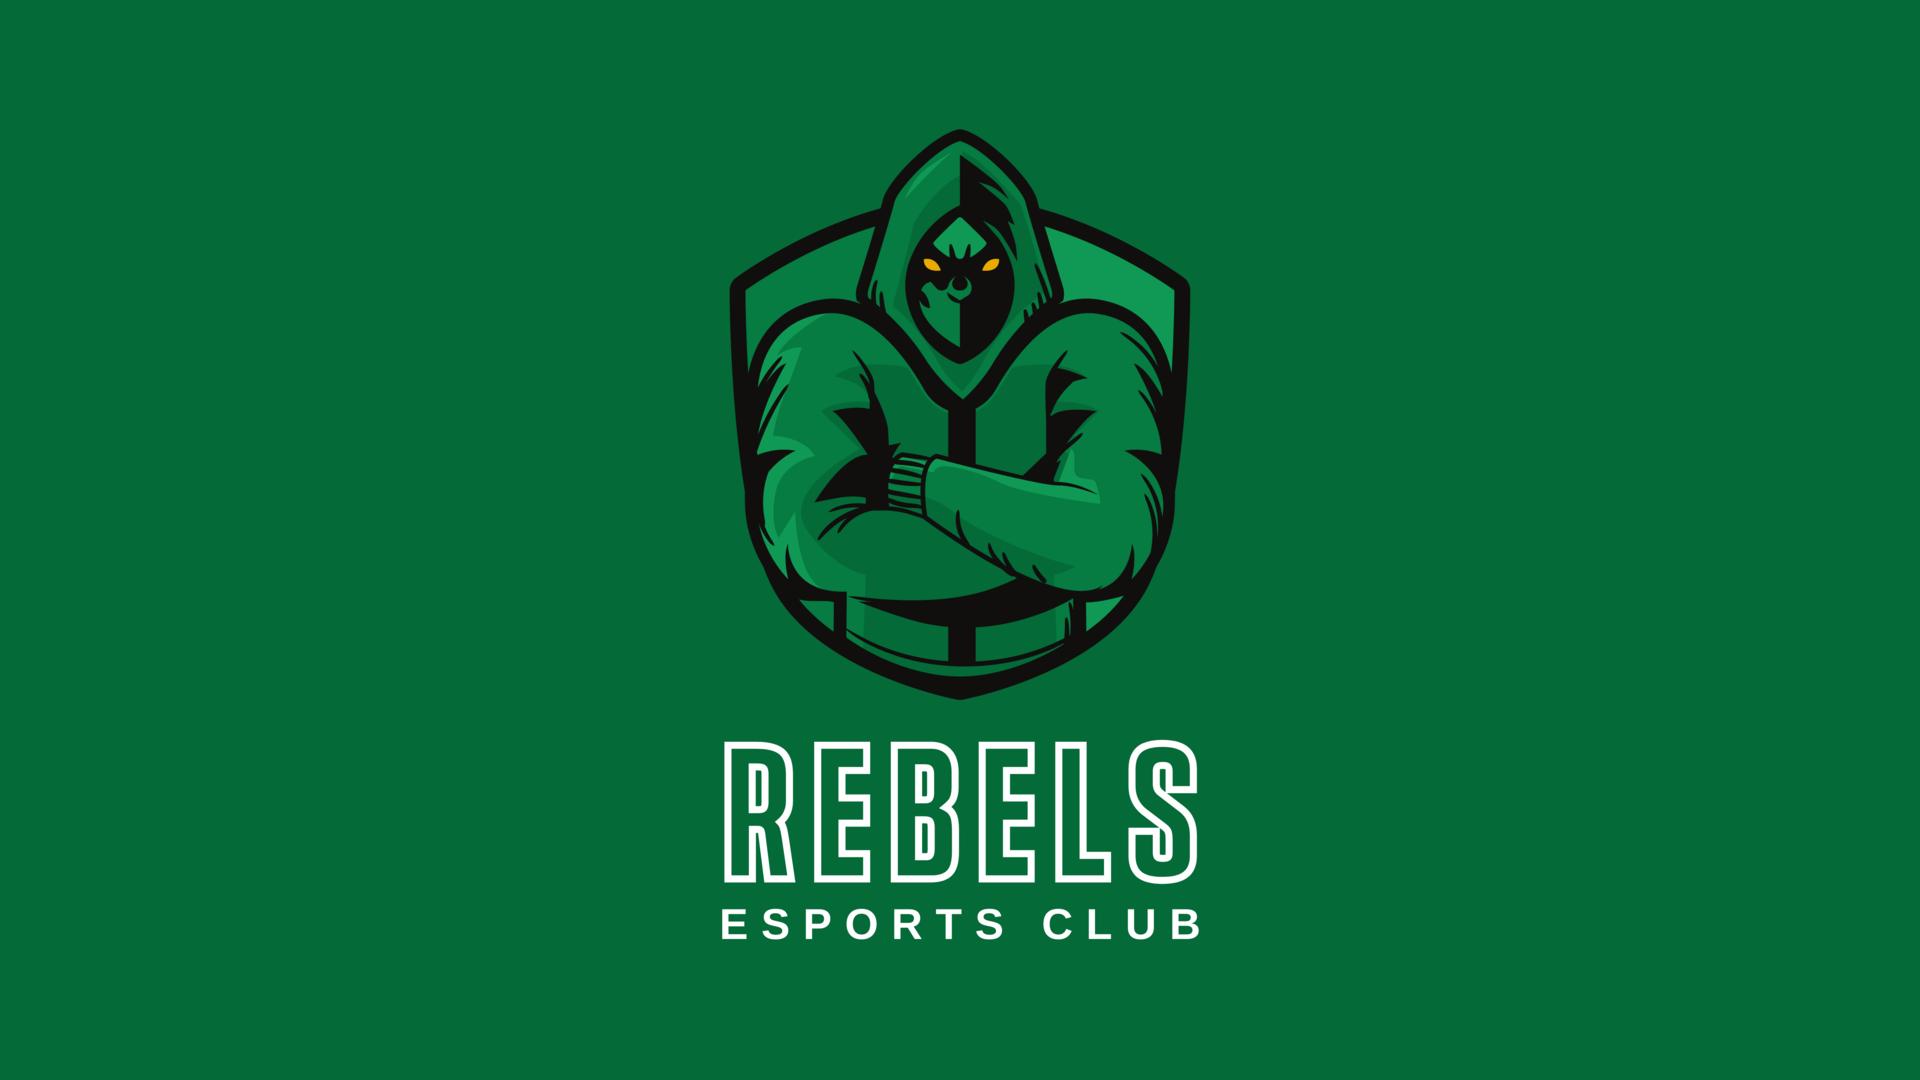 Rebels esports club logo